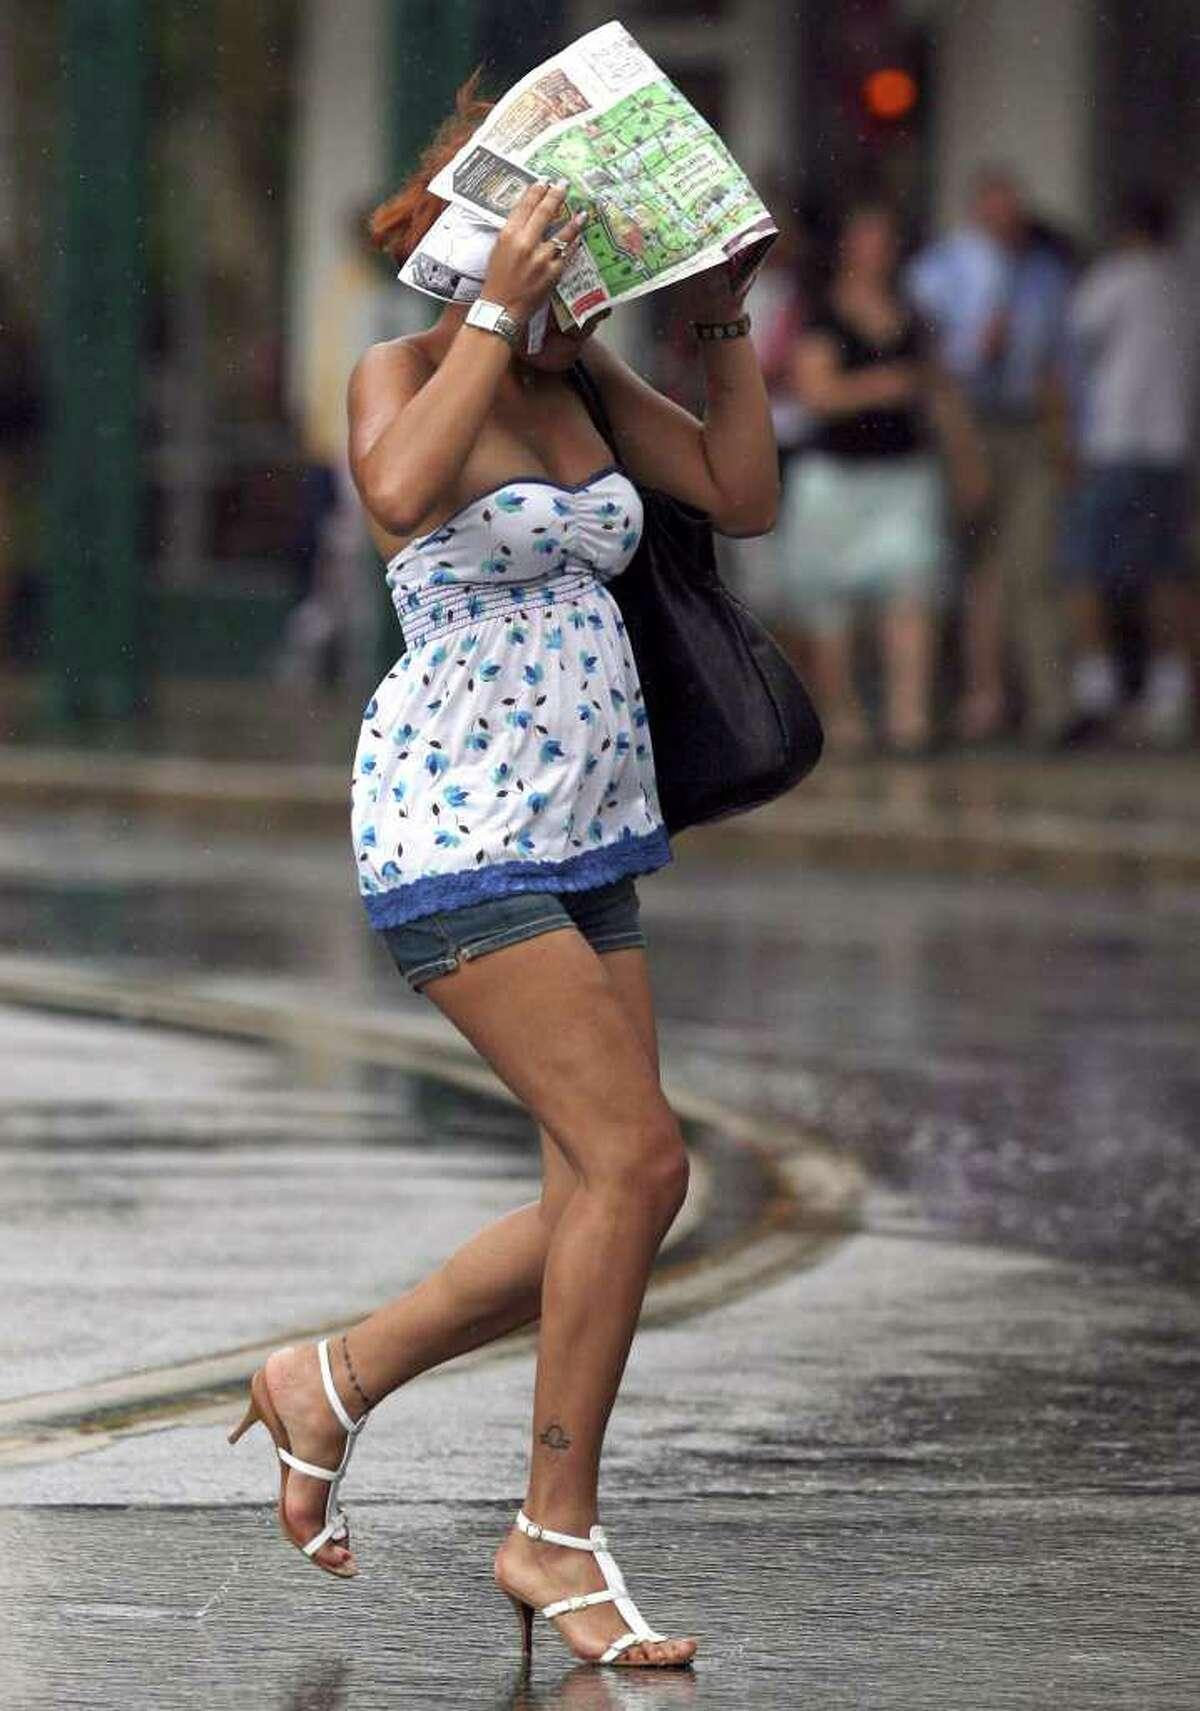 Joanna Estevez covers her head as she crosses Alamo Plaza during a rain storm on Monday July 7, 2008. JOHN DAVENPORT/jdavenport@express-news.net